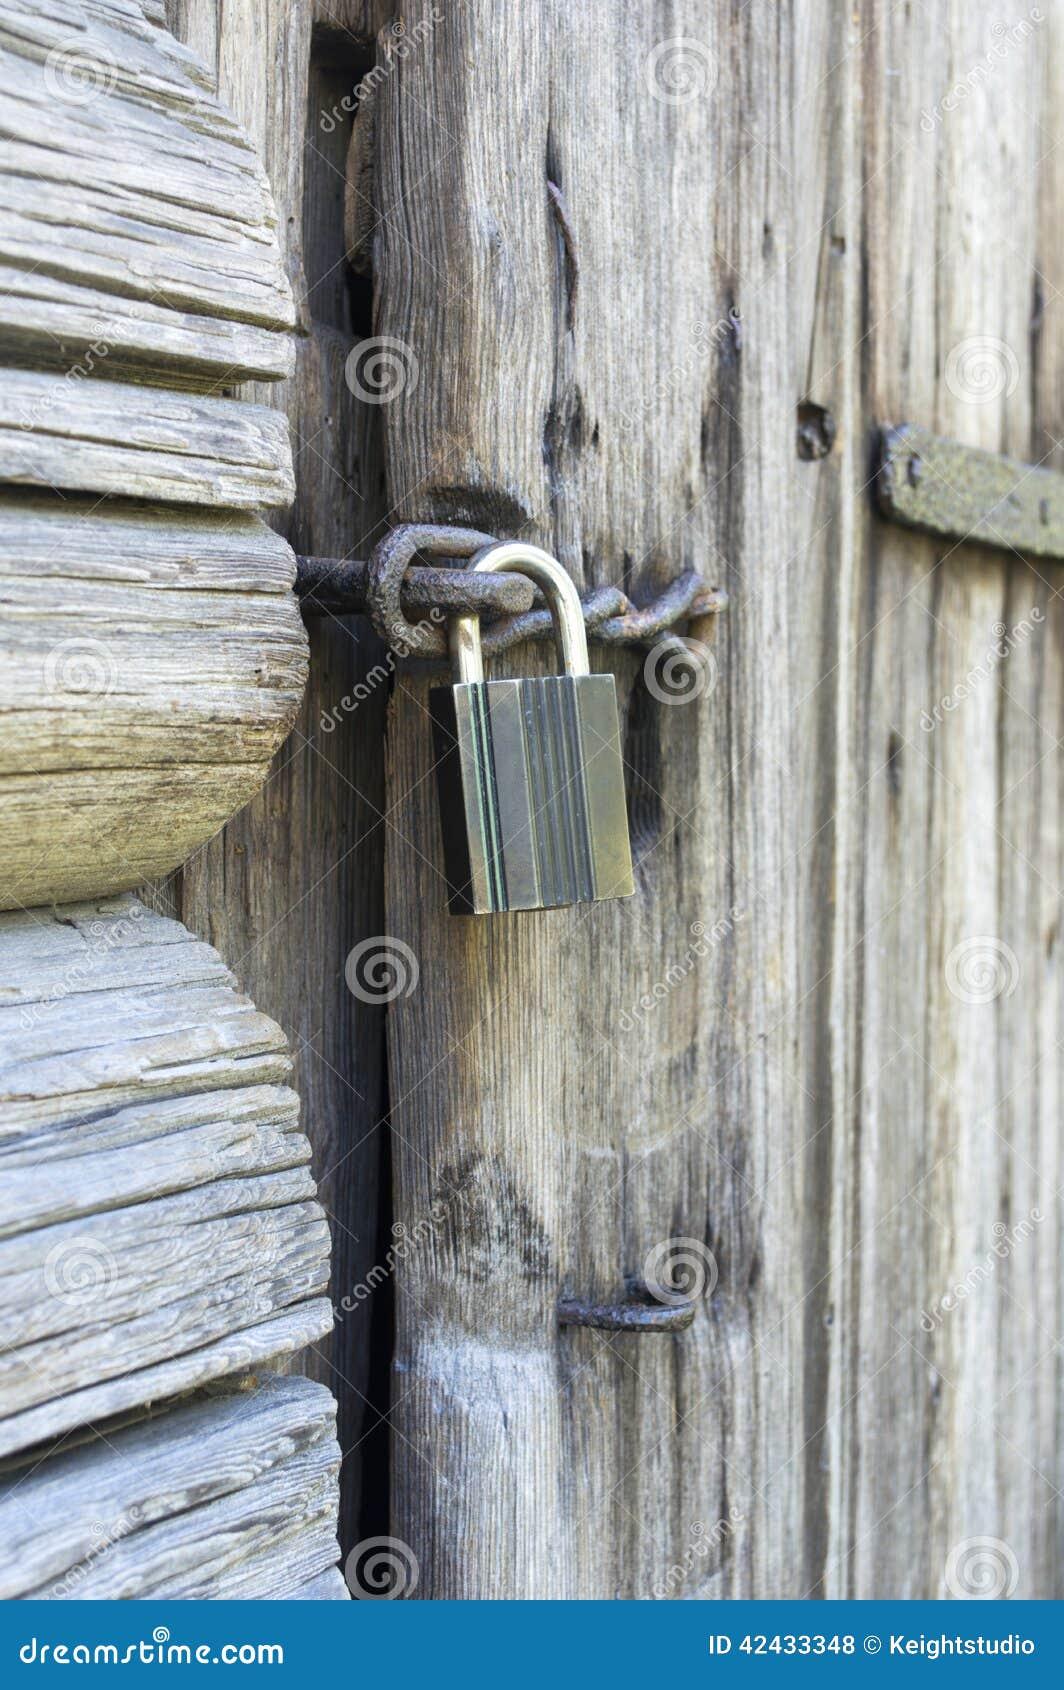 Clouse encima de la cerradura de puerta